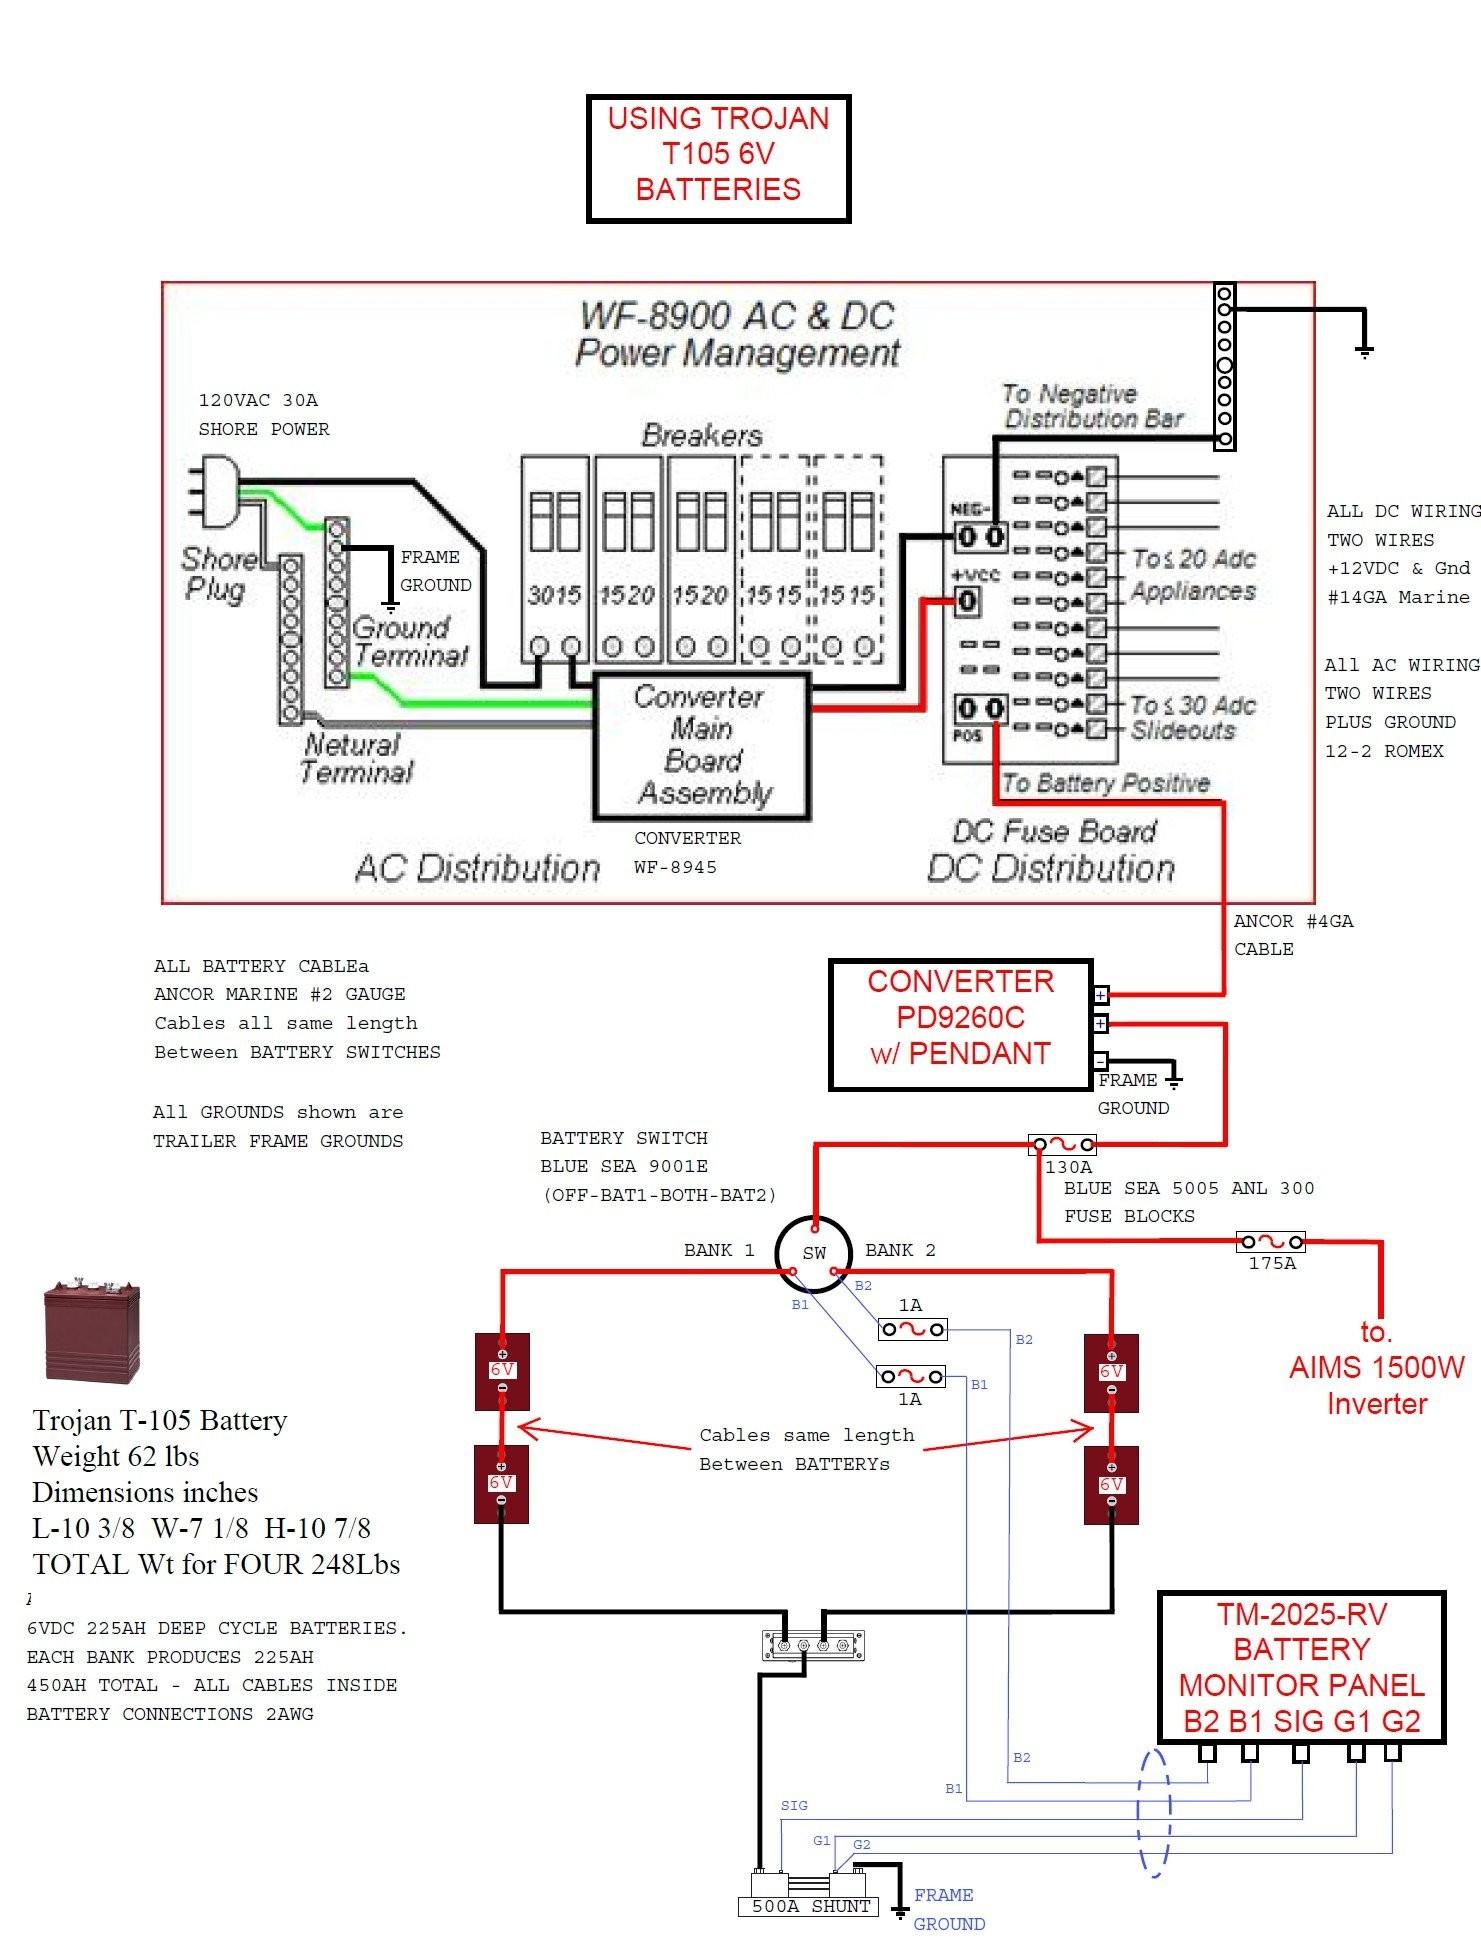 Inverter Wiring Diagram For Camper New 4Uqxh And Rv Converter - Rv Inverter Charger Wiring Diagram